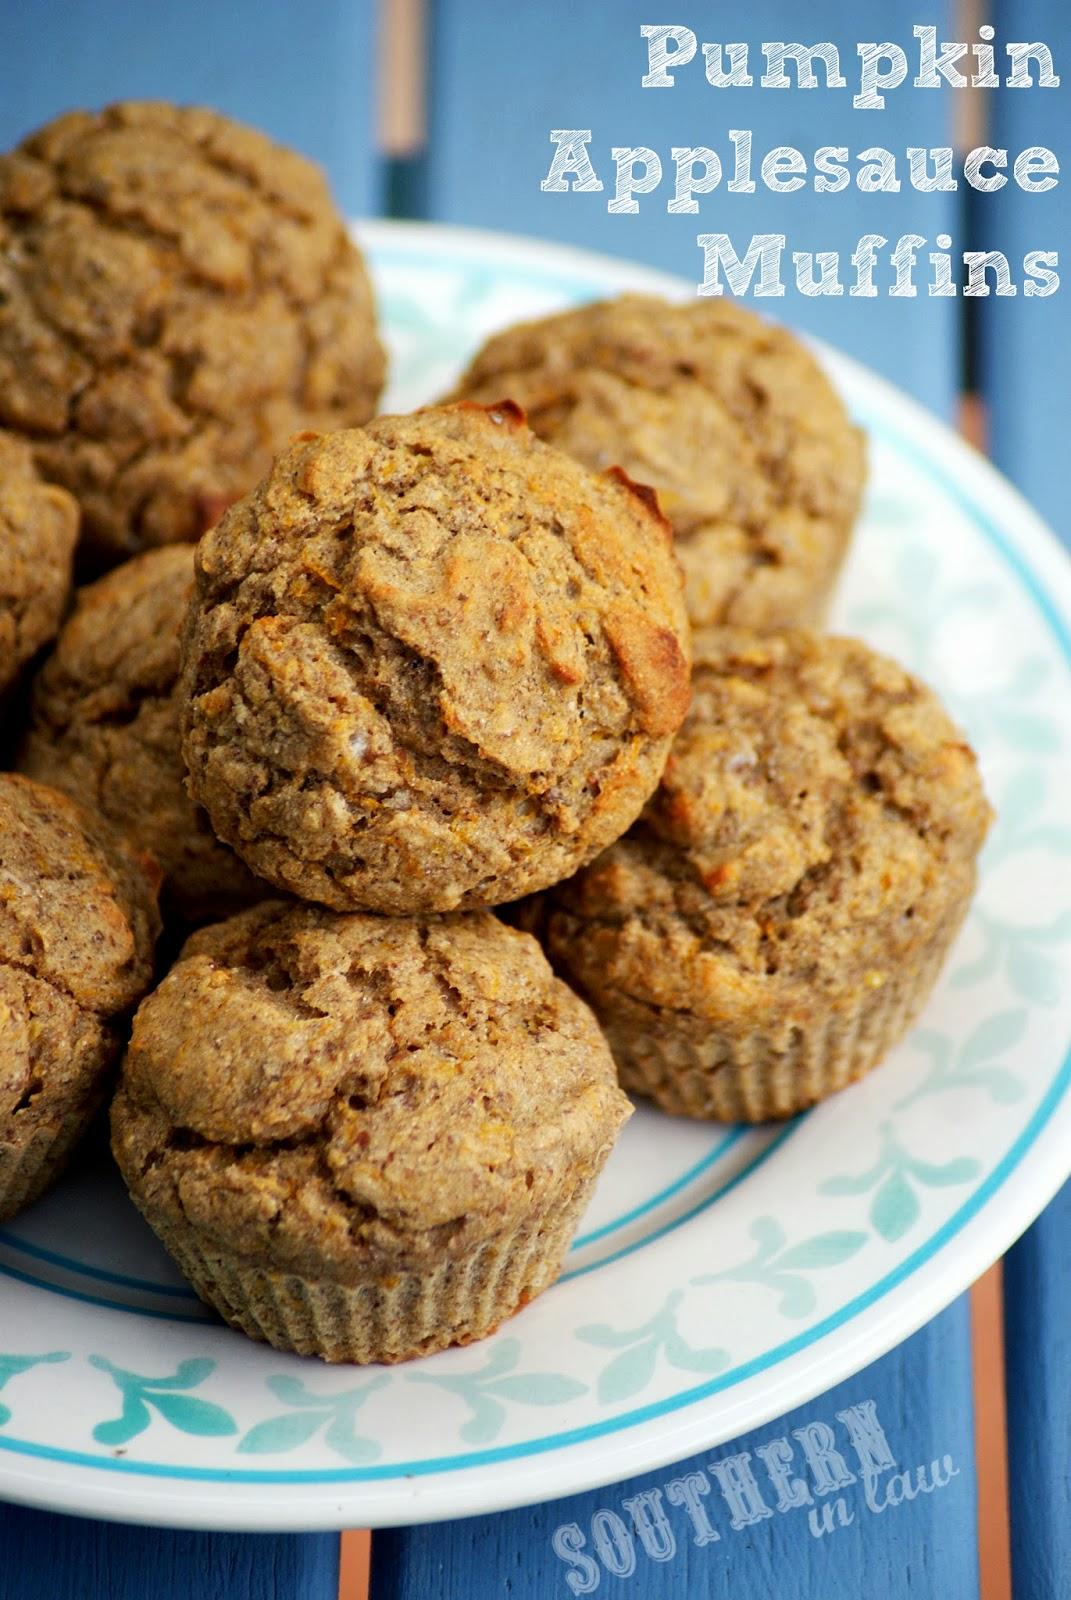 ... Pumpkin Applesauce Muffins - gluten free, vegan, low fat, sugar free